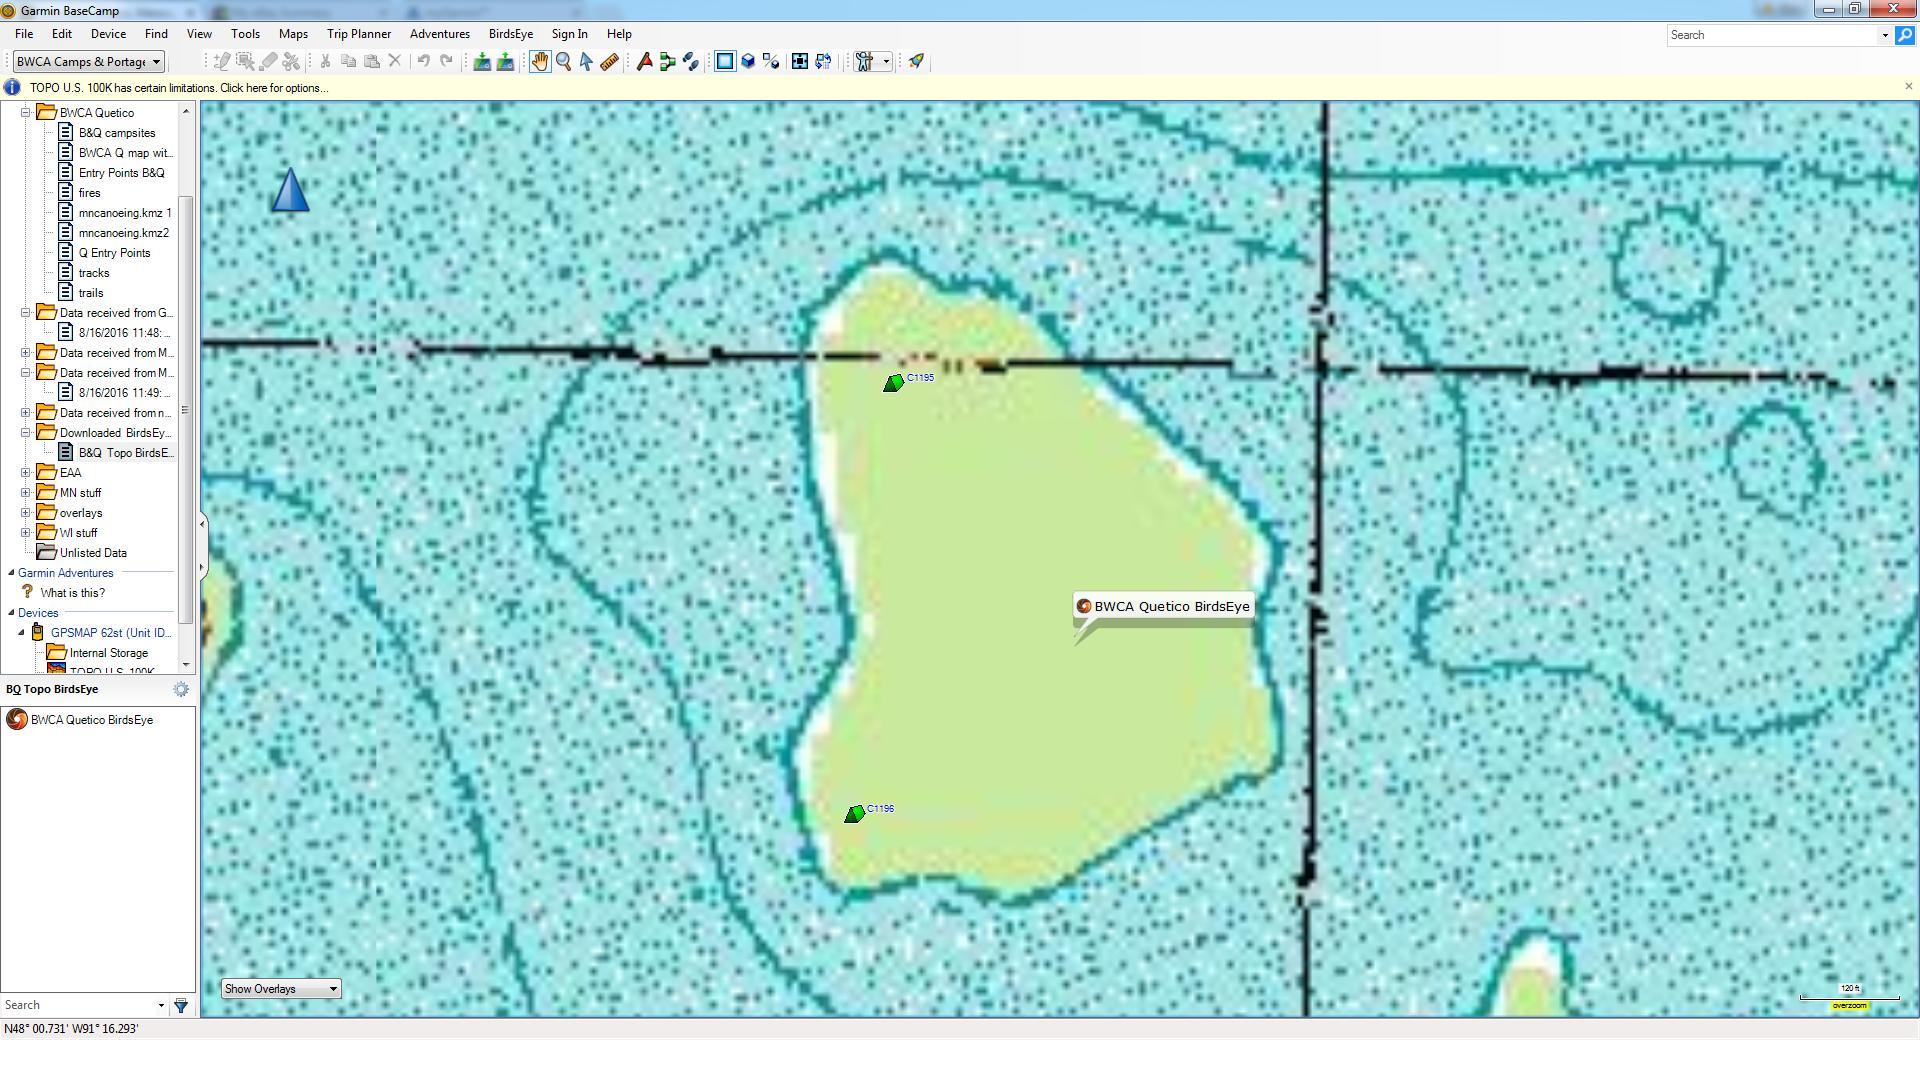 BWCA BirdsEye Topo Maps Boundary Waters Private Group Forum GPS - Us topographic map kmz